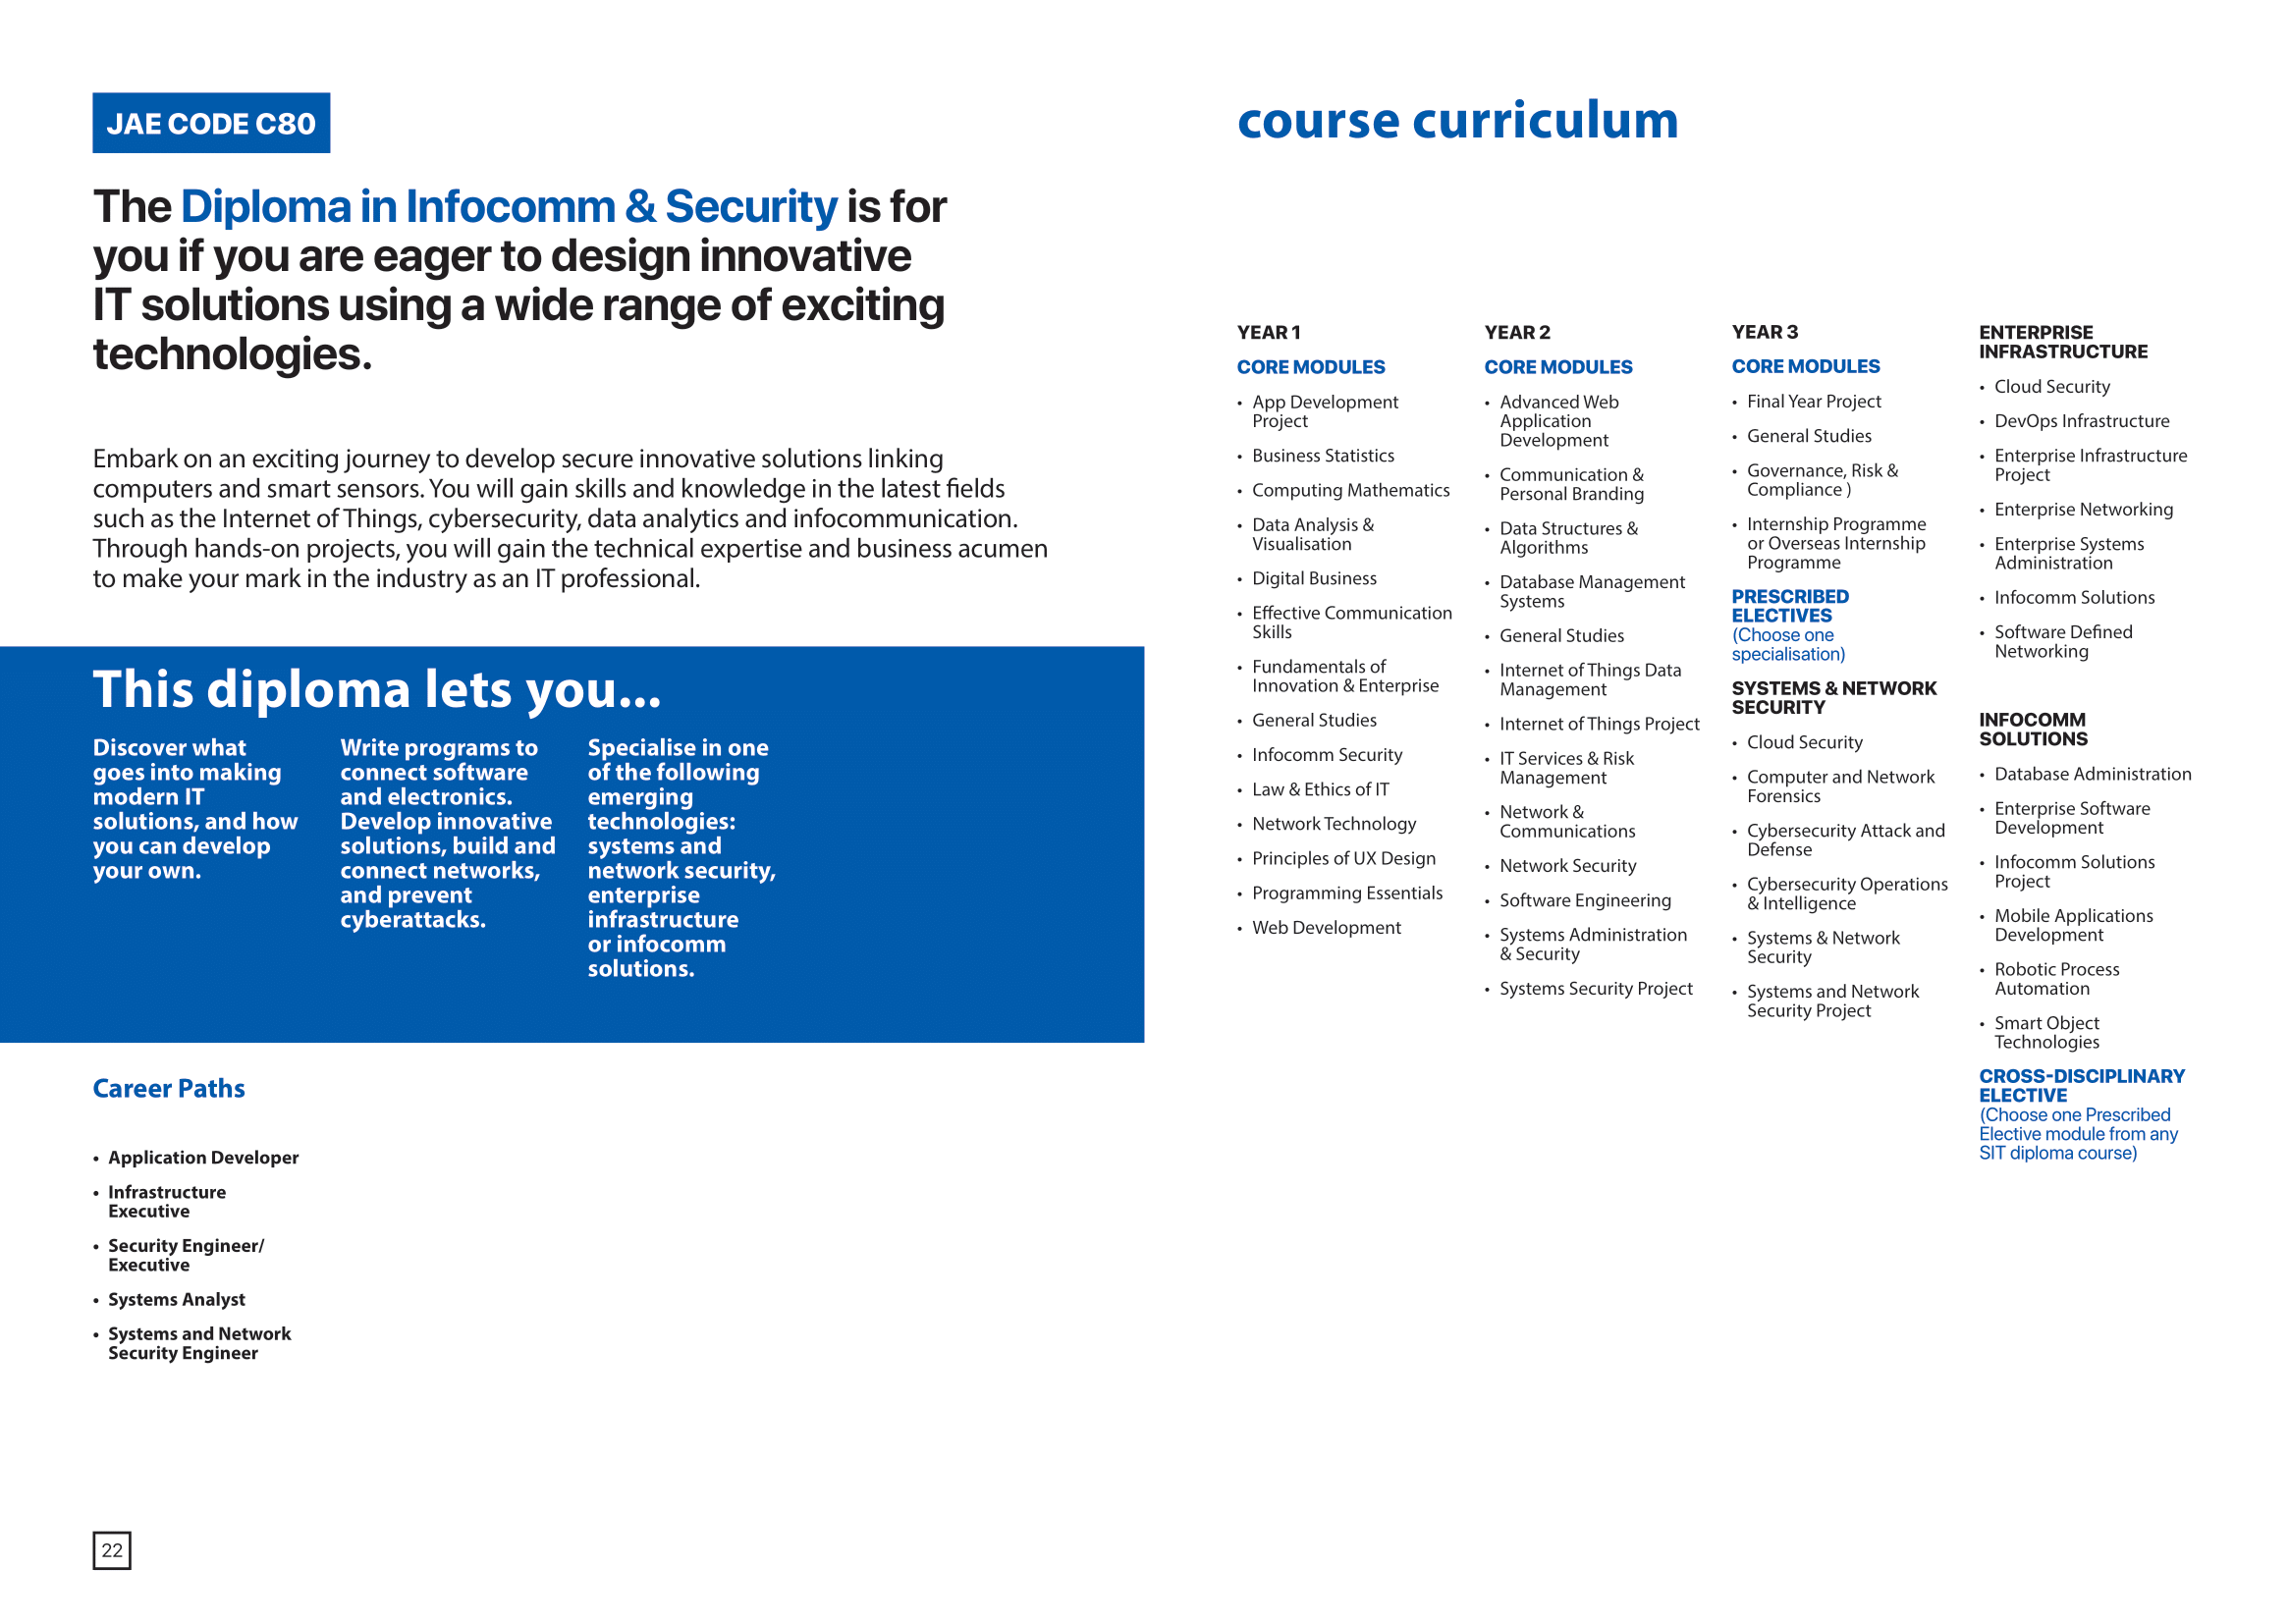 School of Information Technology 2020-13